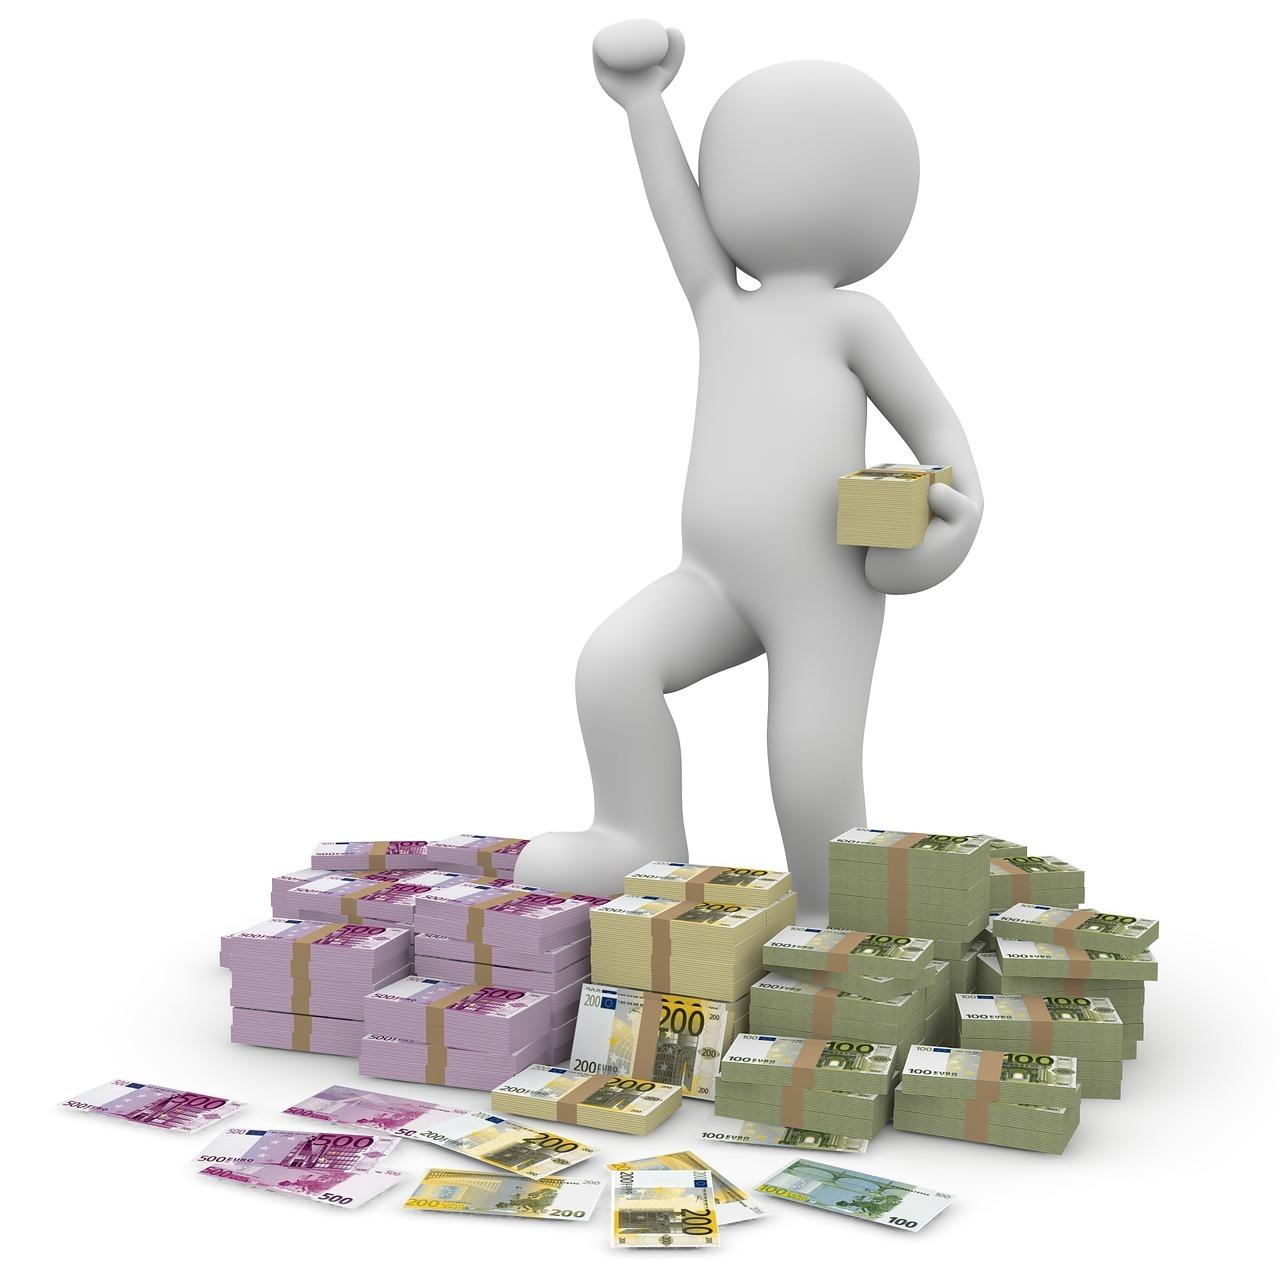 money-1015277_1280.jpg